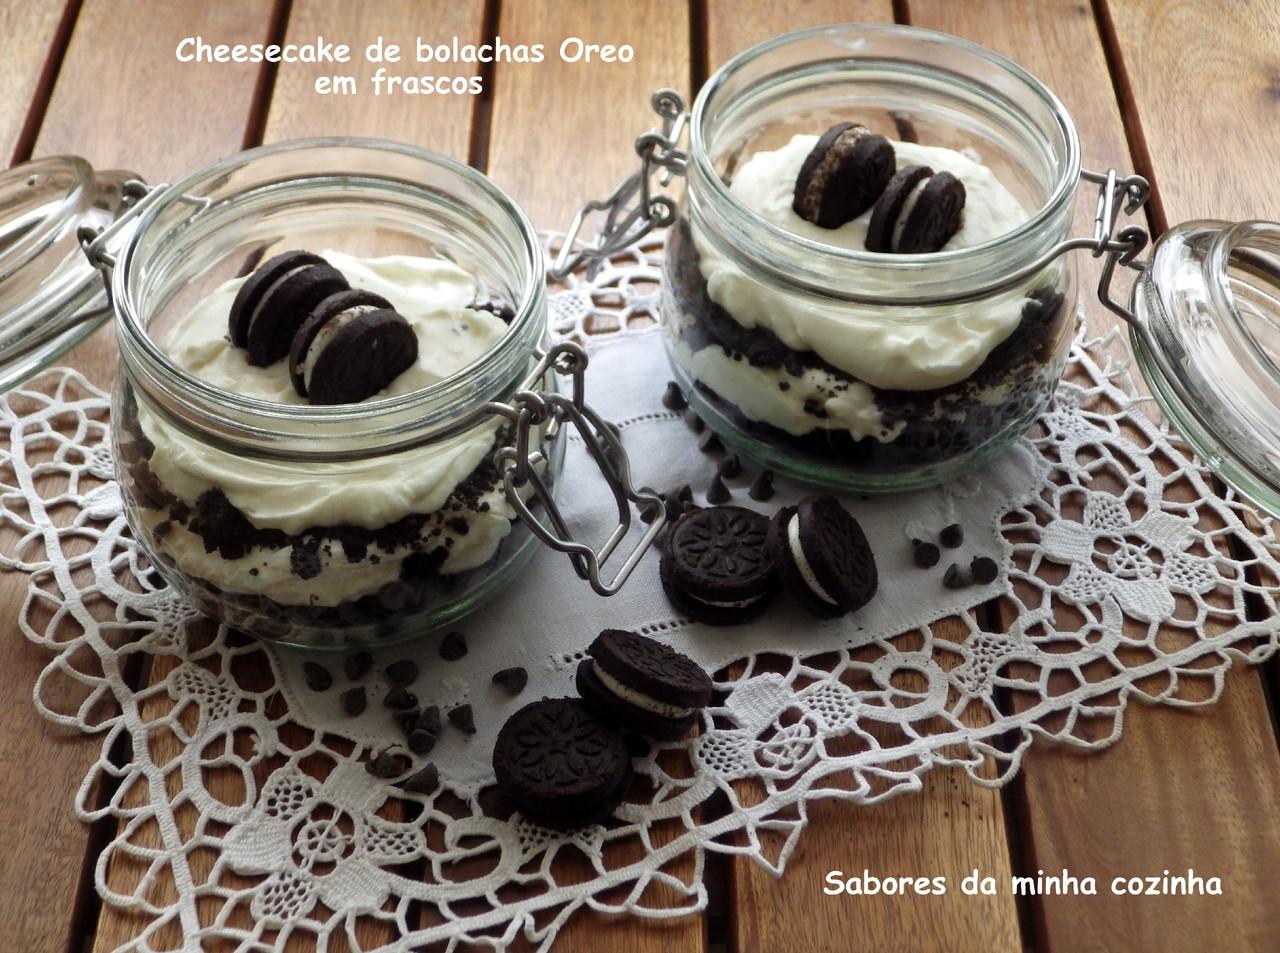 IMGP5725-Cheesecake de bolachas Oreo-Blog.JPG